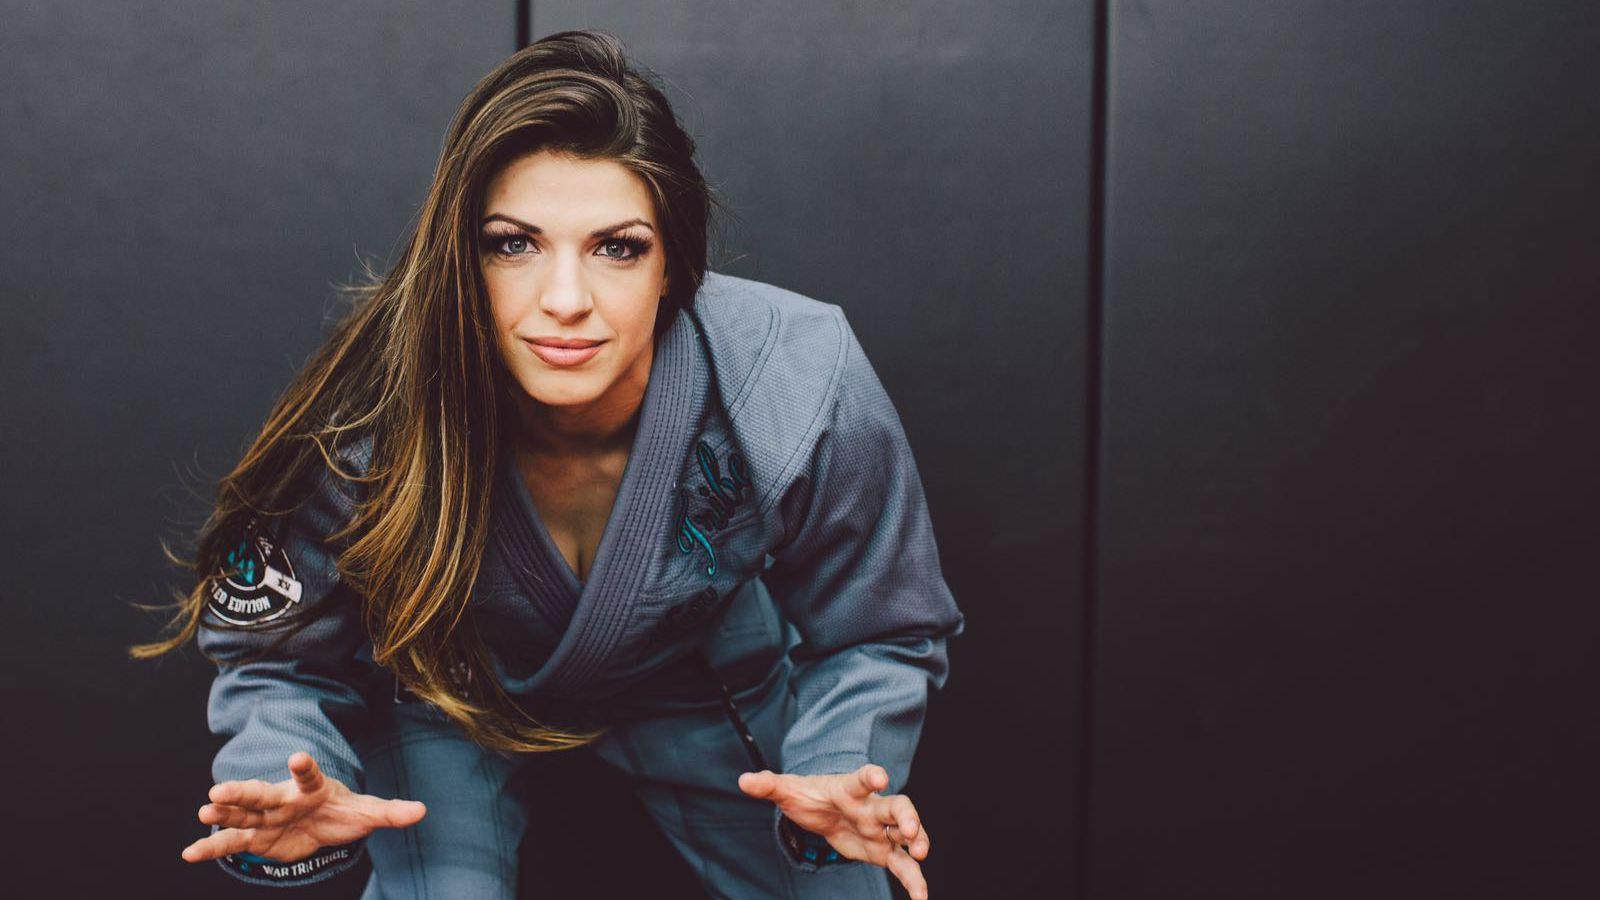 BJJ Gear for women: Why is it so important? 1